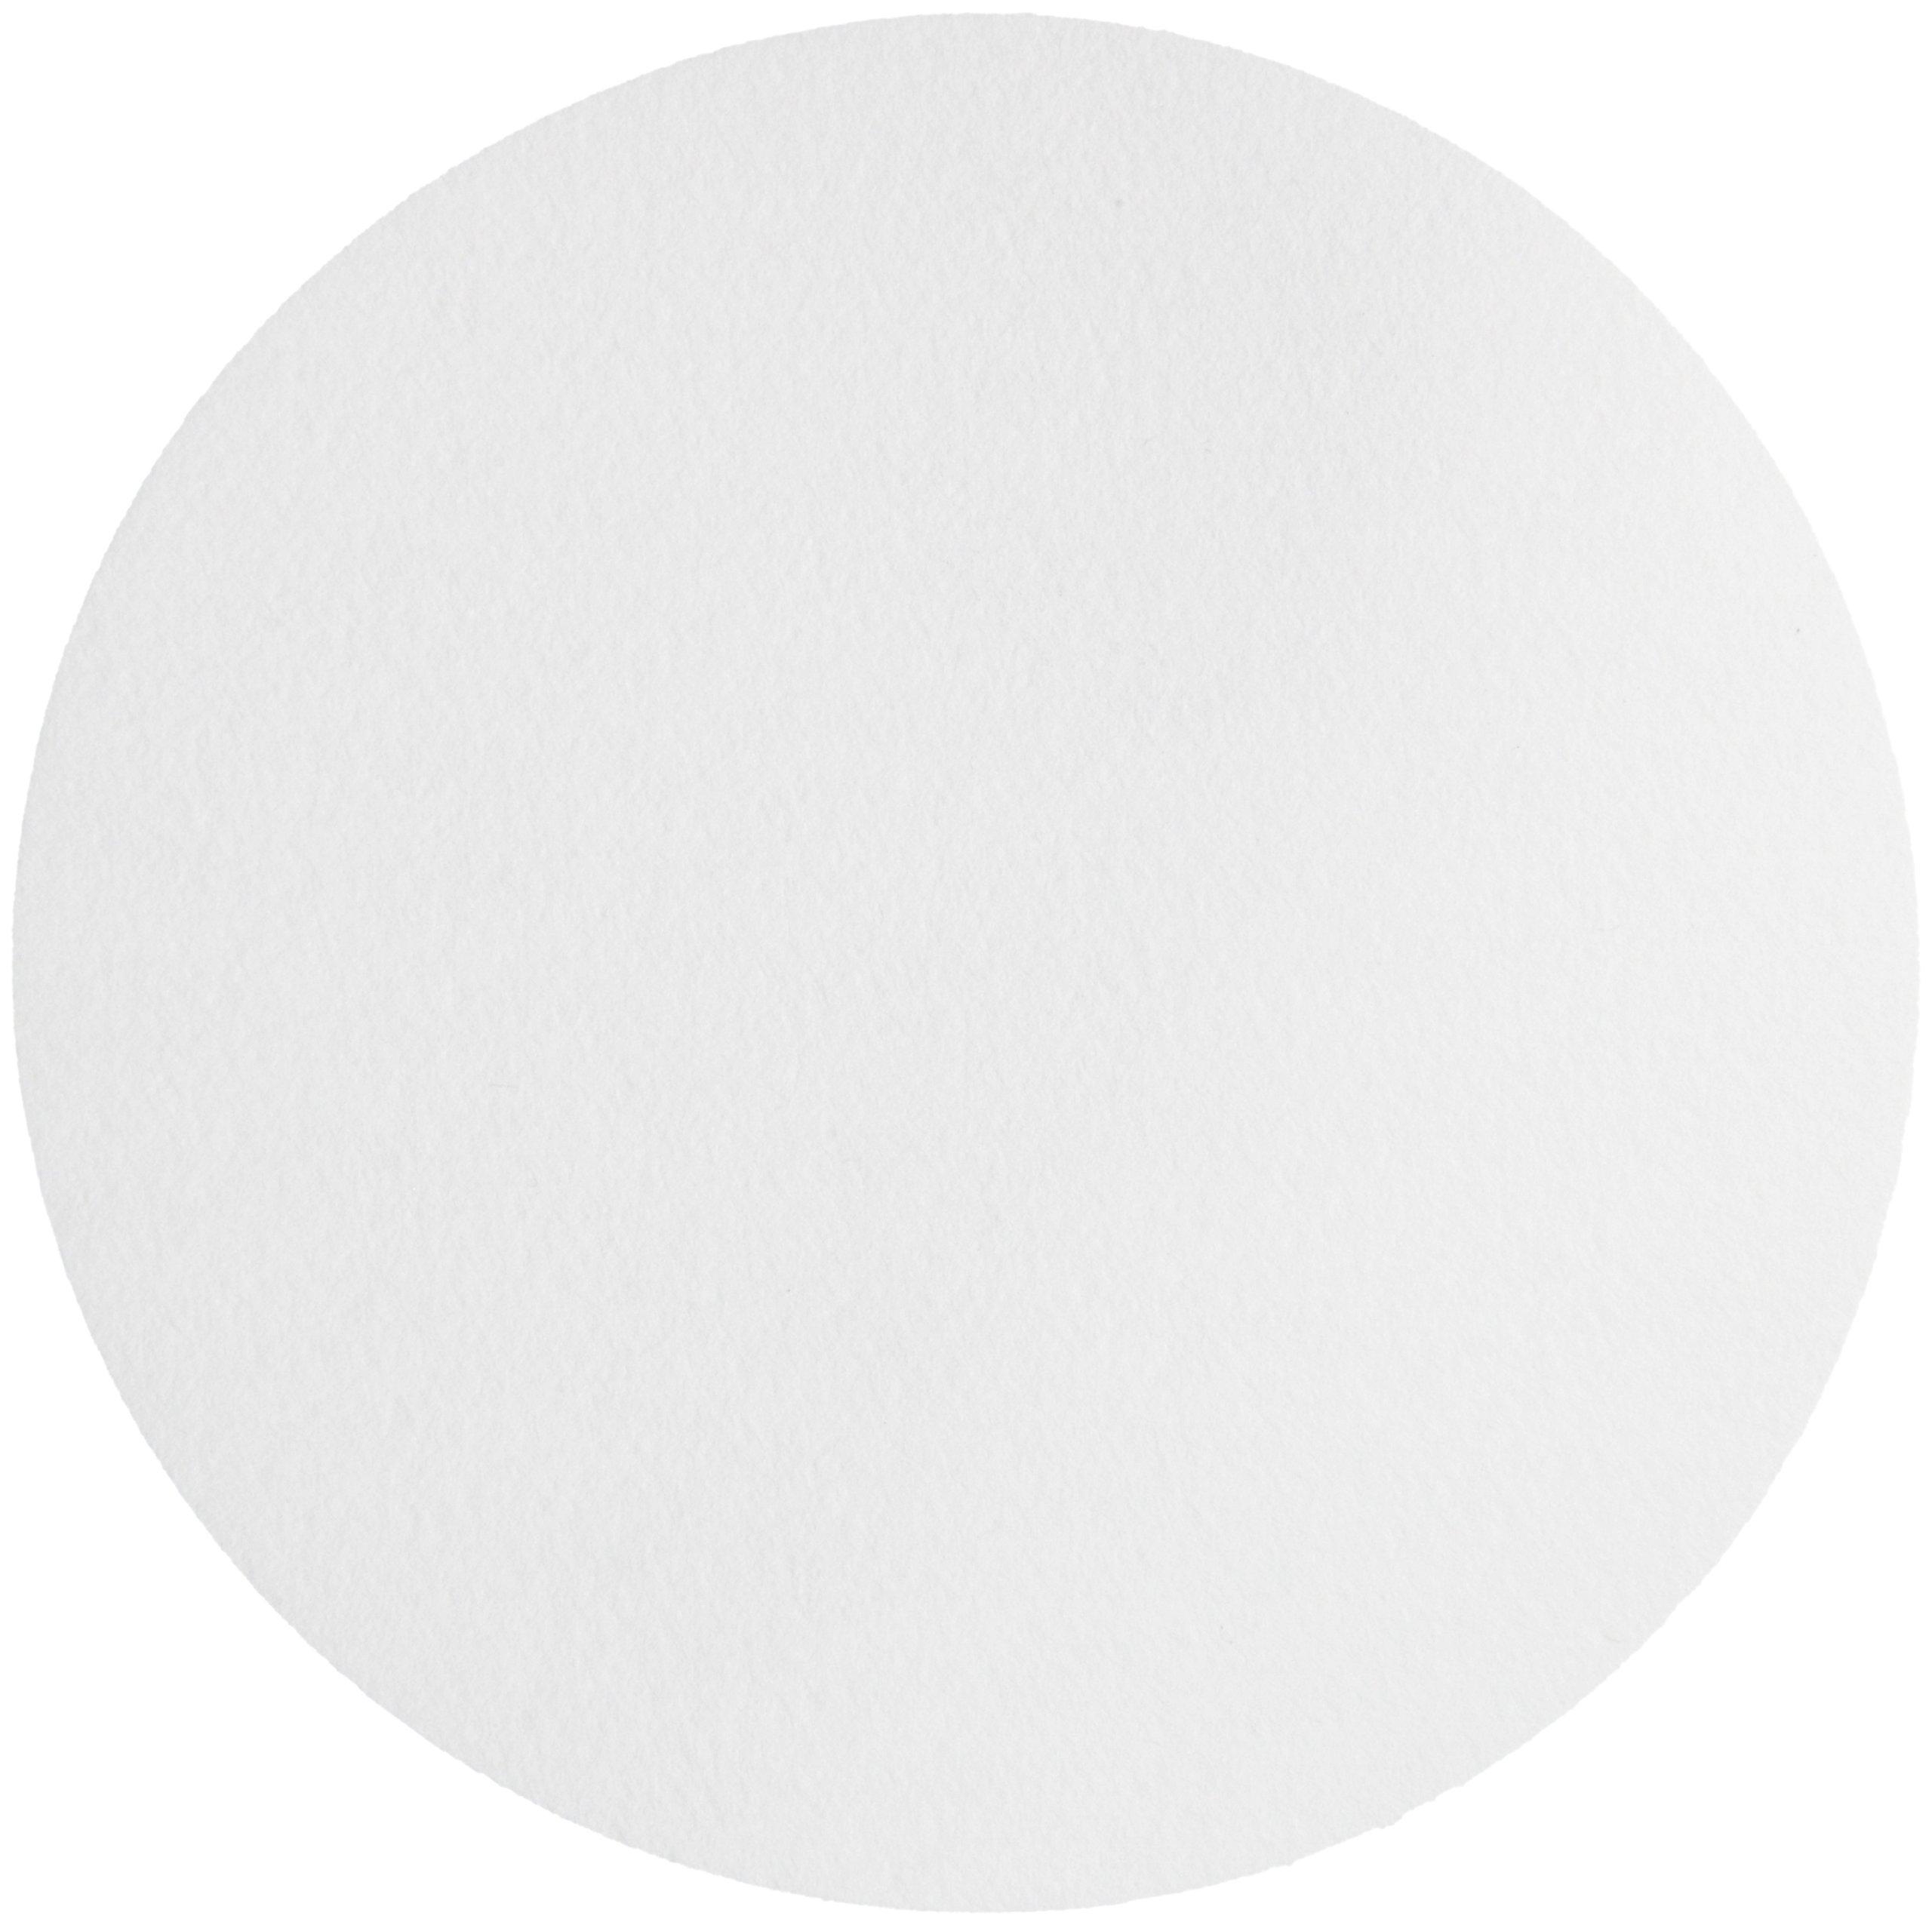 Whatman 1005-110 Quantitative Filter Paper Circles, 2.5 Micron, 94 s/100mL/sq inch Flow Rate, Grade 5, 110mm Diameter (Pack of 100) by Whatman